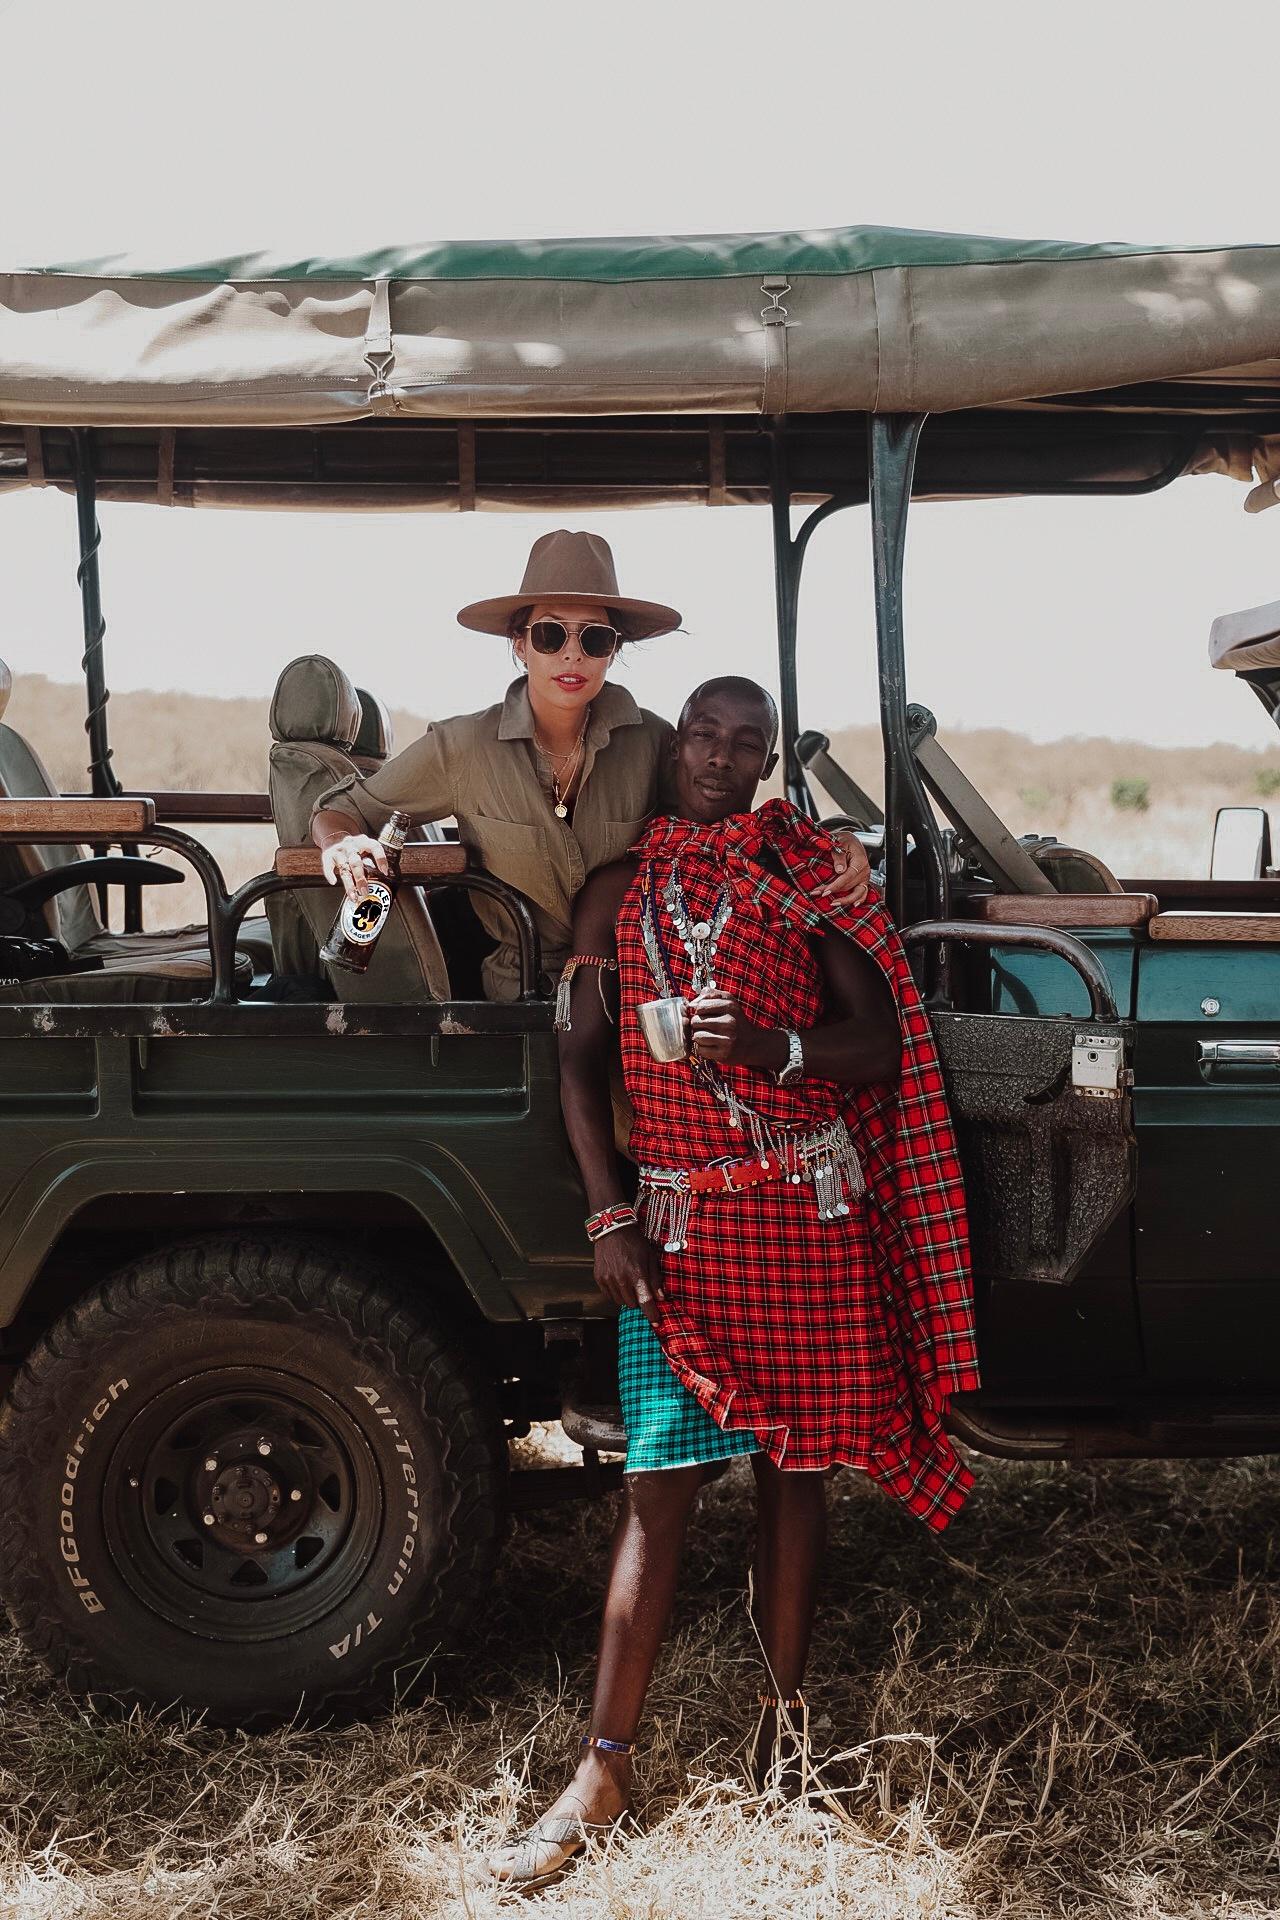 Maasai Warrior on Safari in Kenya, Africa Ph. Valorie Darling